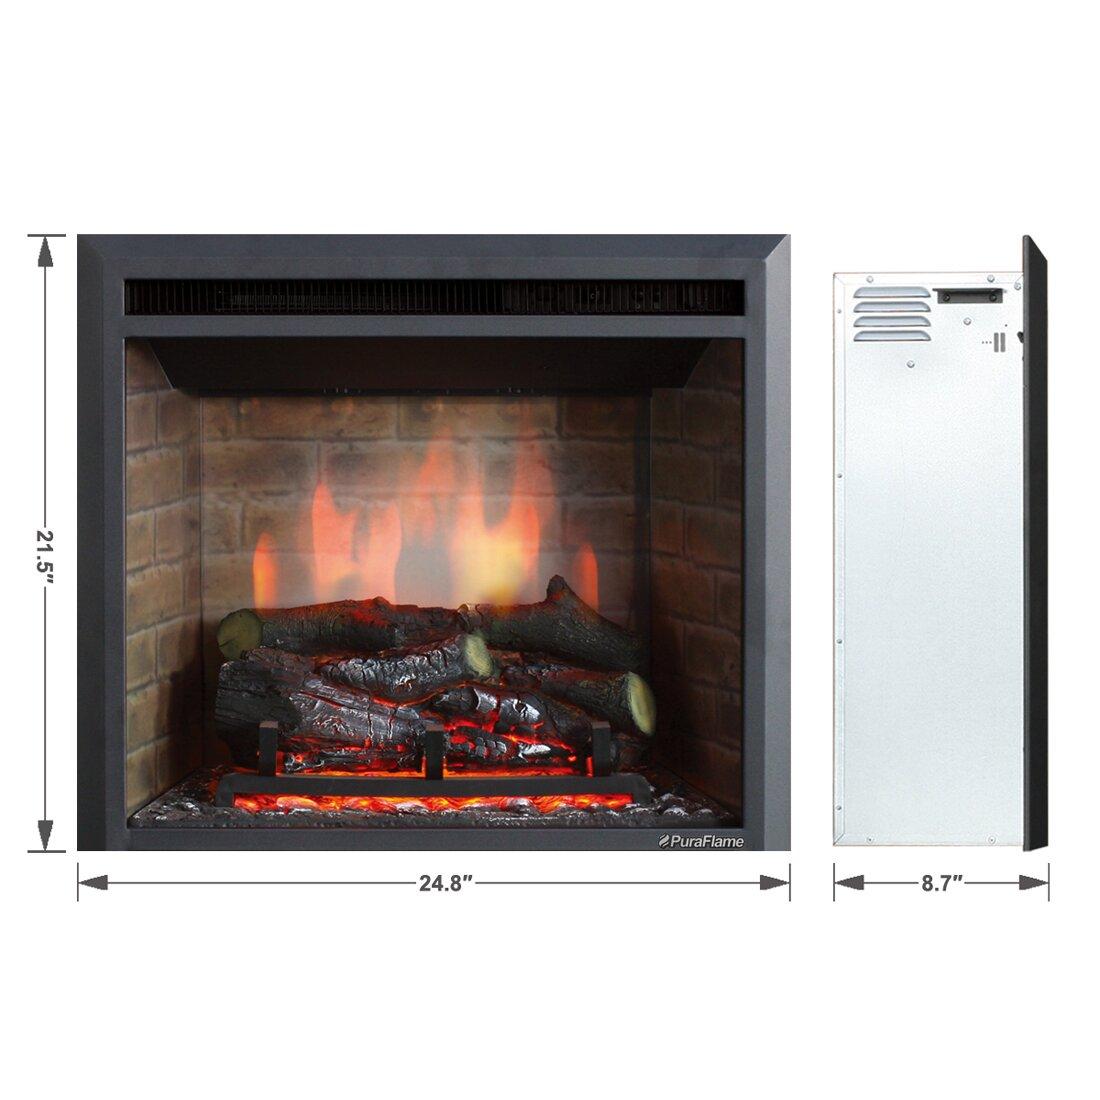 Puraflame 33 Black 750 1500w Western Electric Fireplace Insert Reviews Wayfair